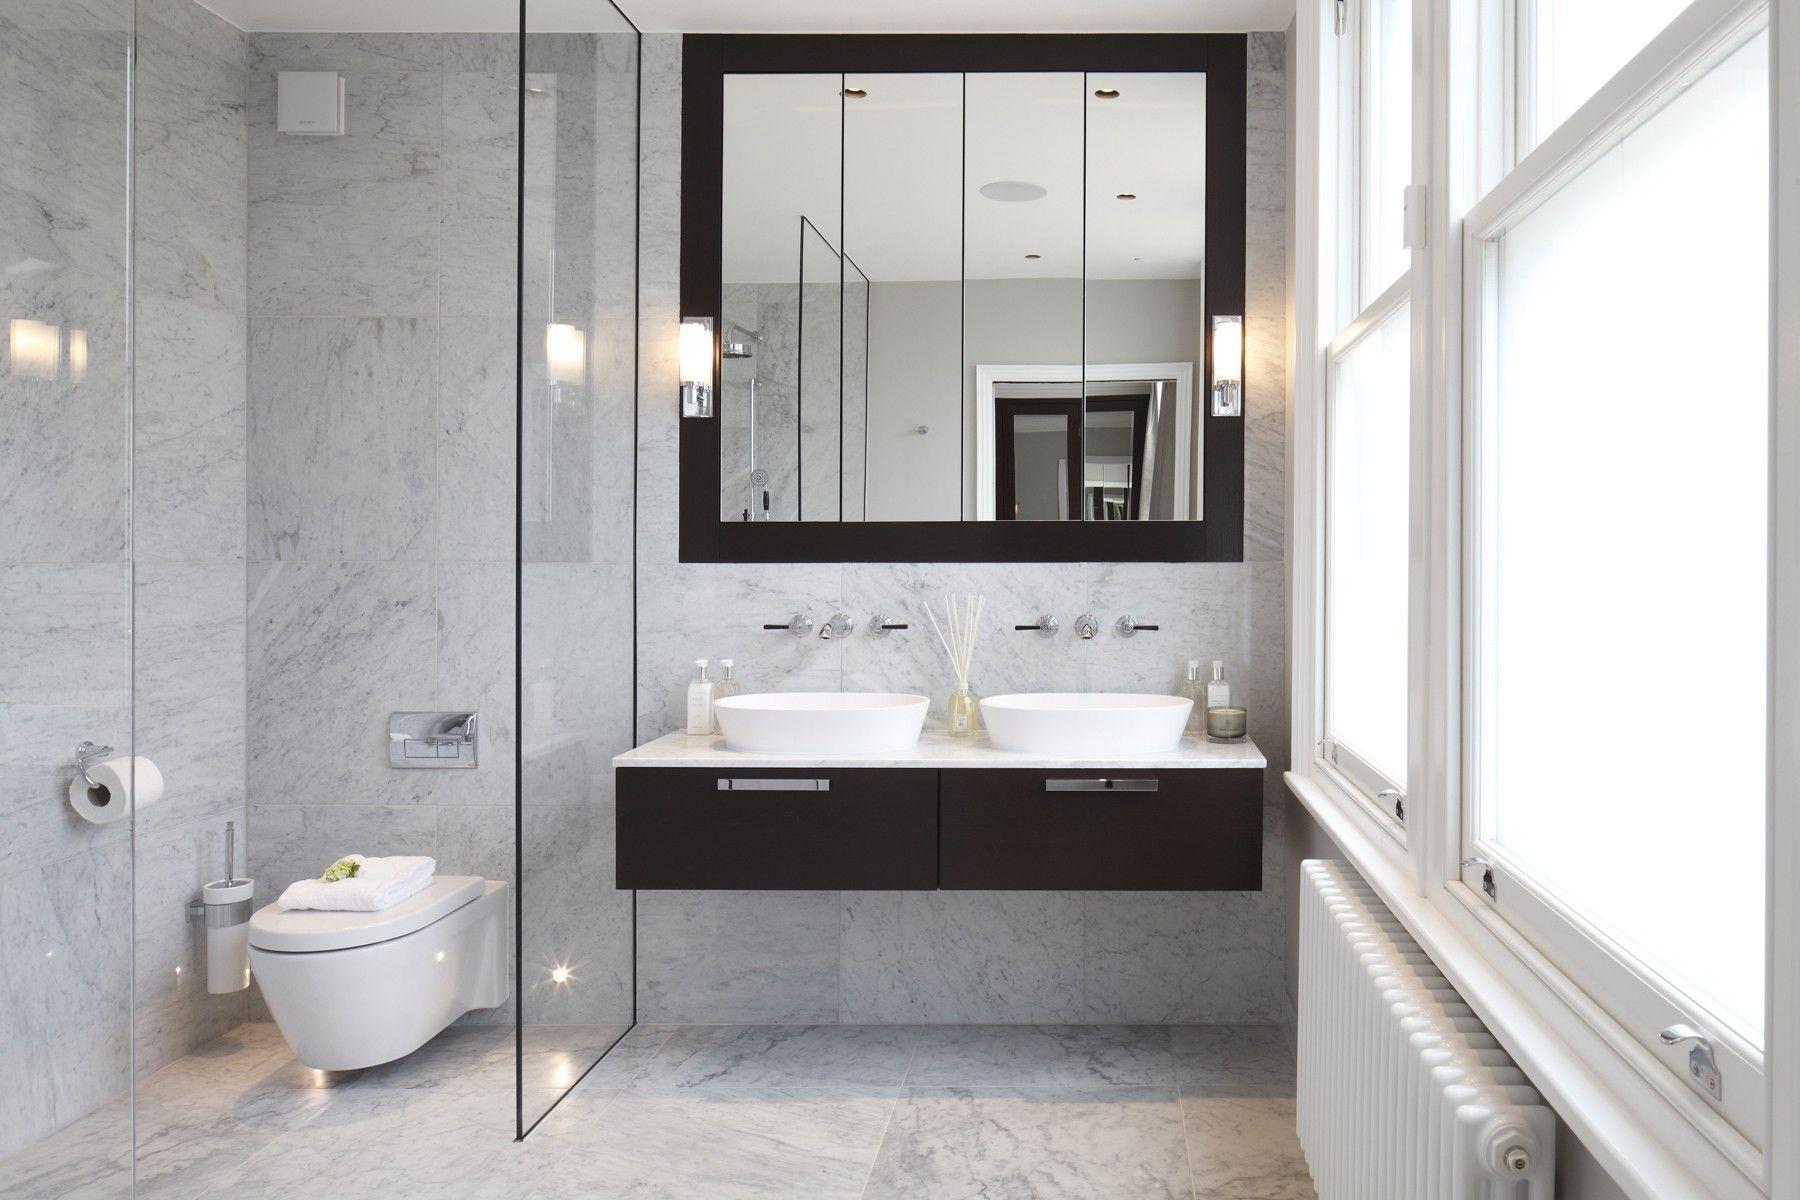 St albans ave chiswick london interior design laura for Bathroom interior design london